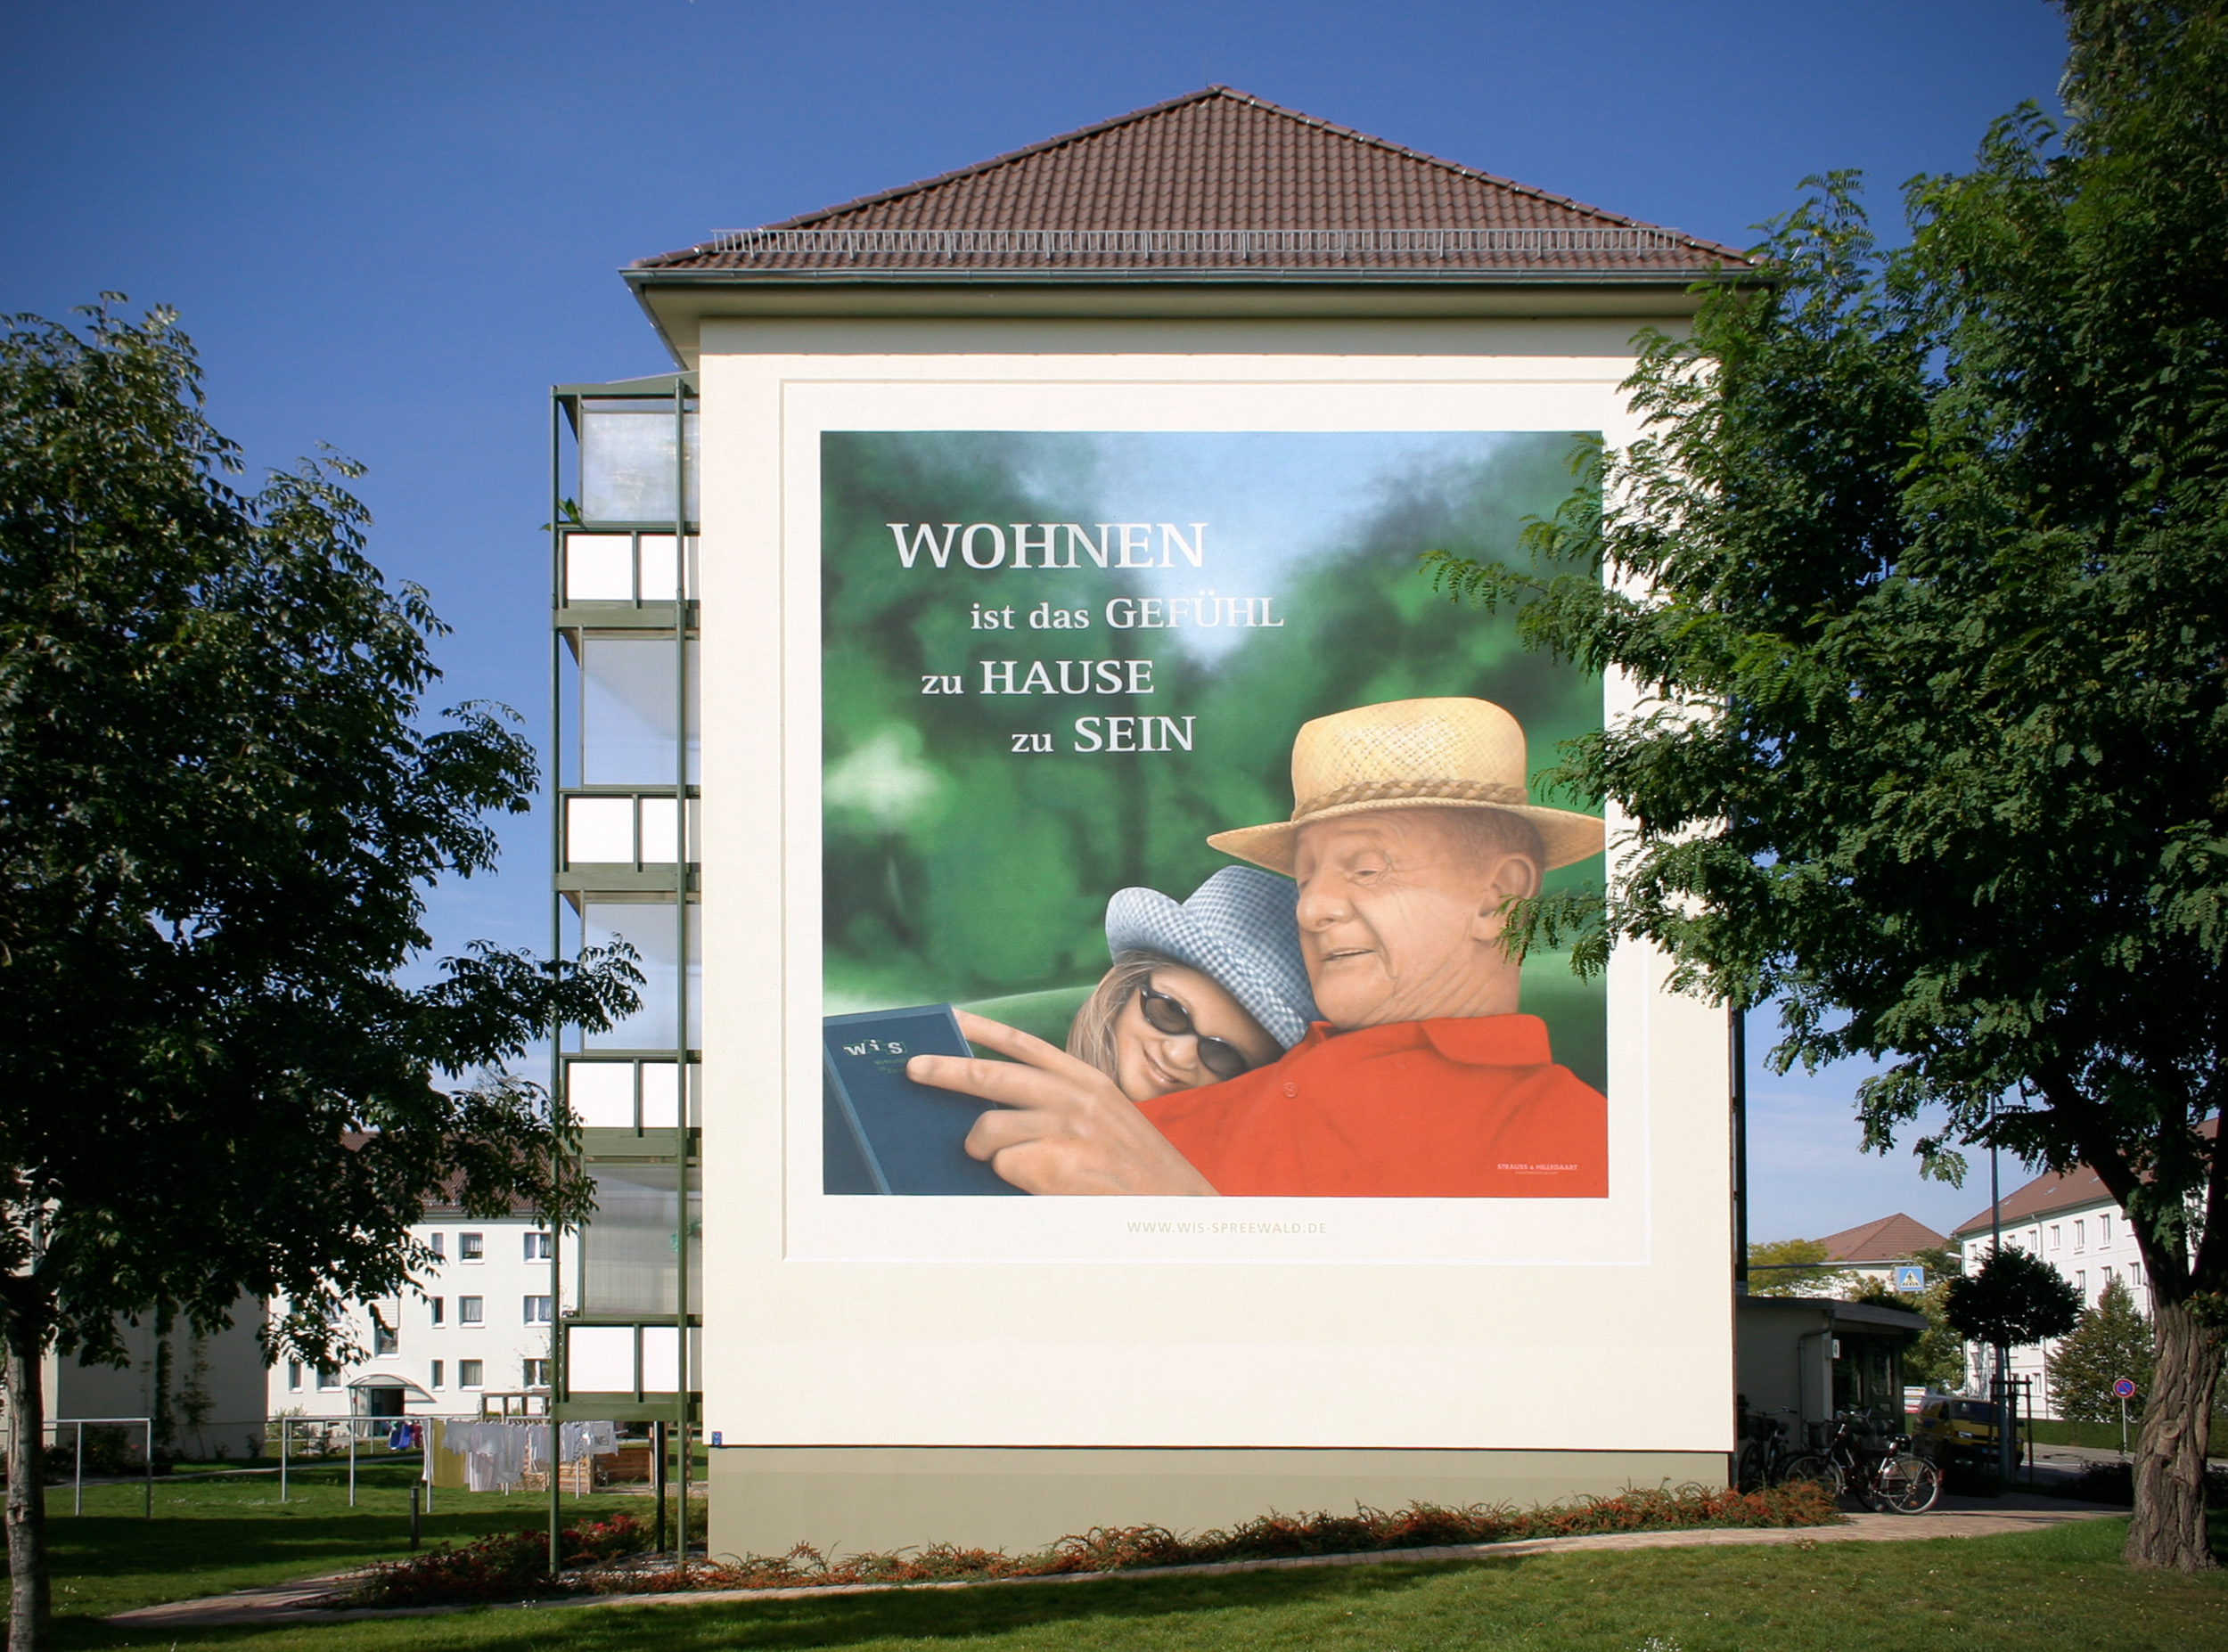 Fassadengestaltung-kein-graffiti-wandbild-malerei.jpg